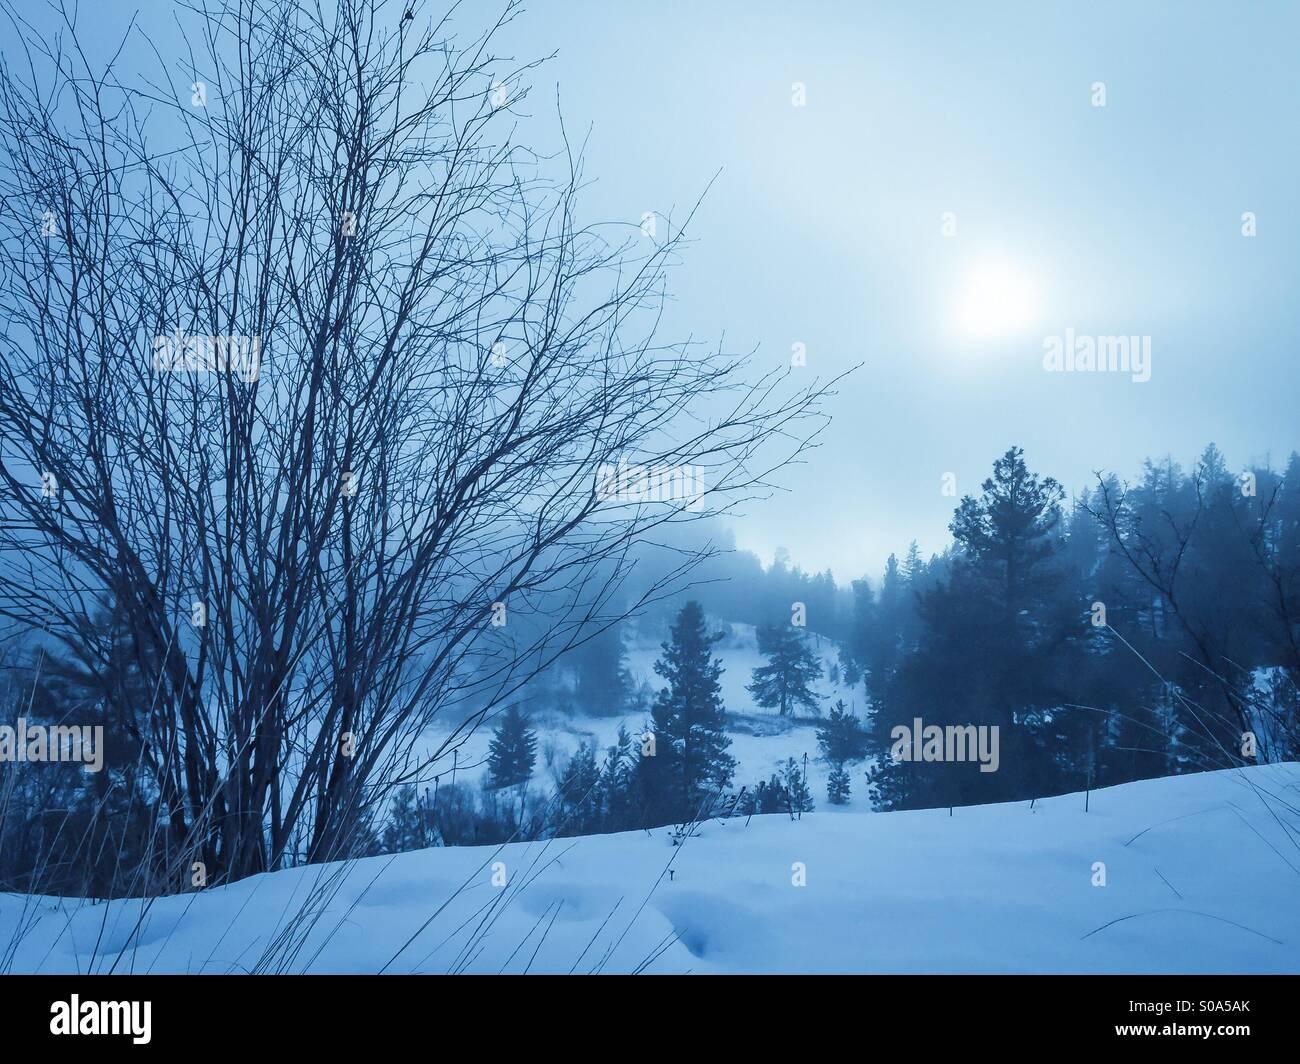 Winter landscape of fog covered evergreen forest. - Stock Image